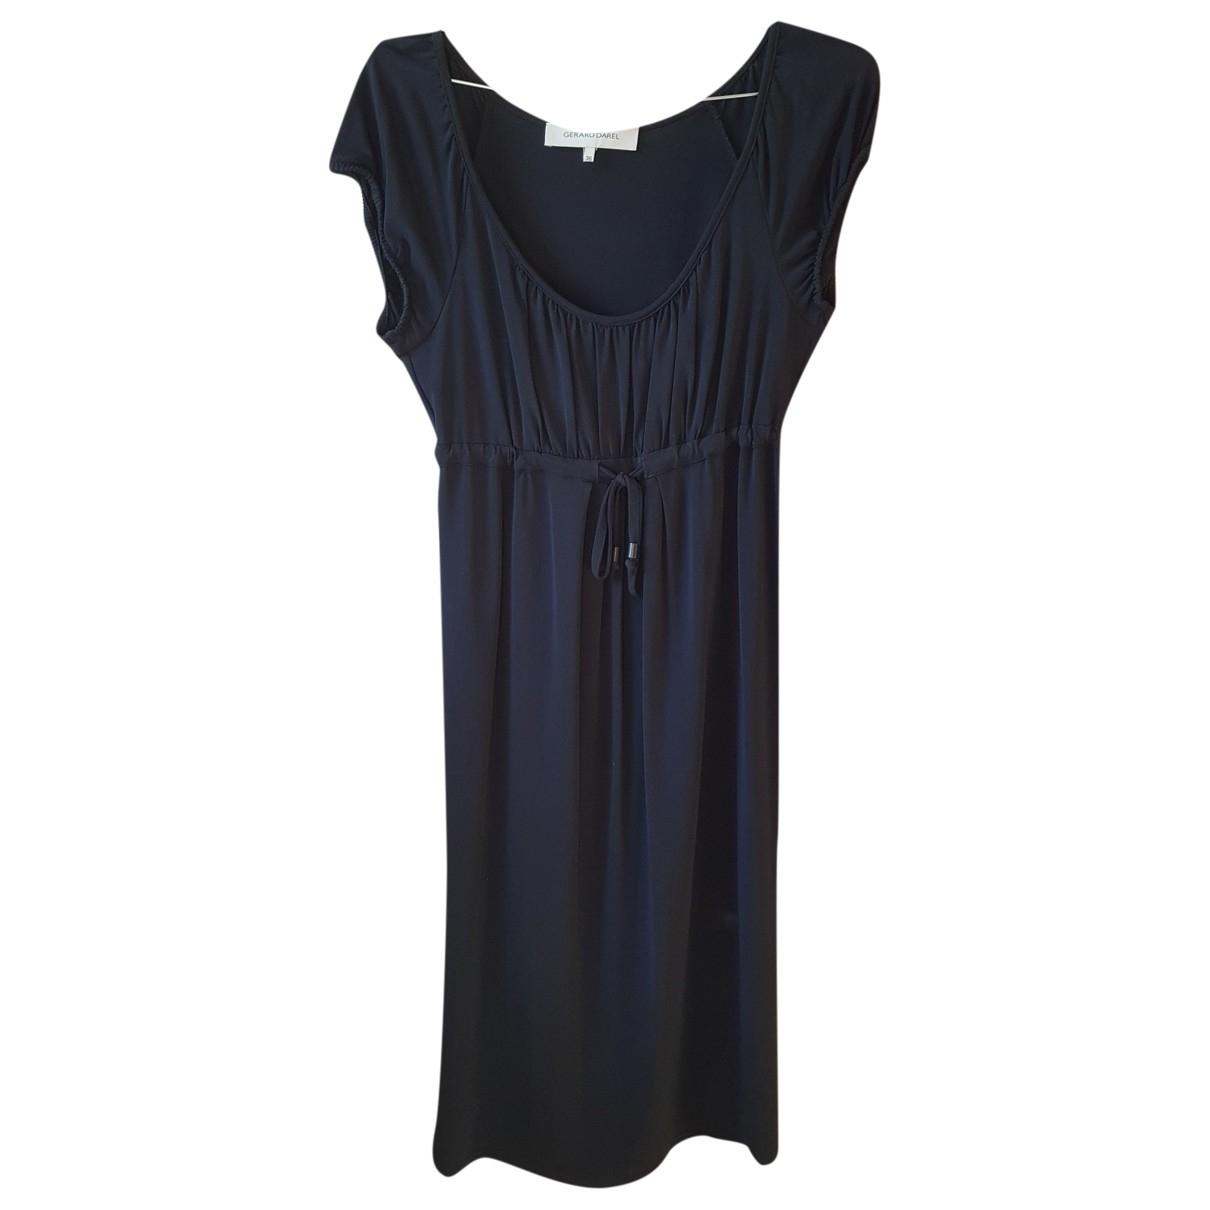 Gerard Darel \N Black dress for Women 36 FR